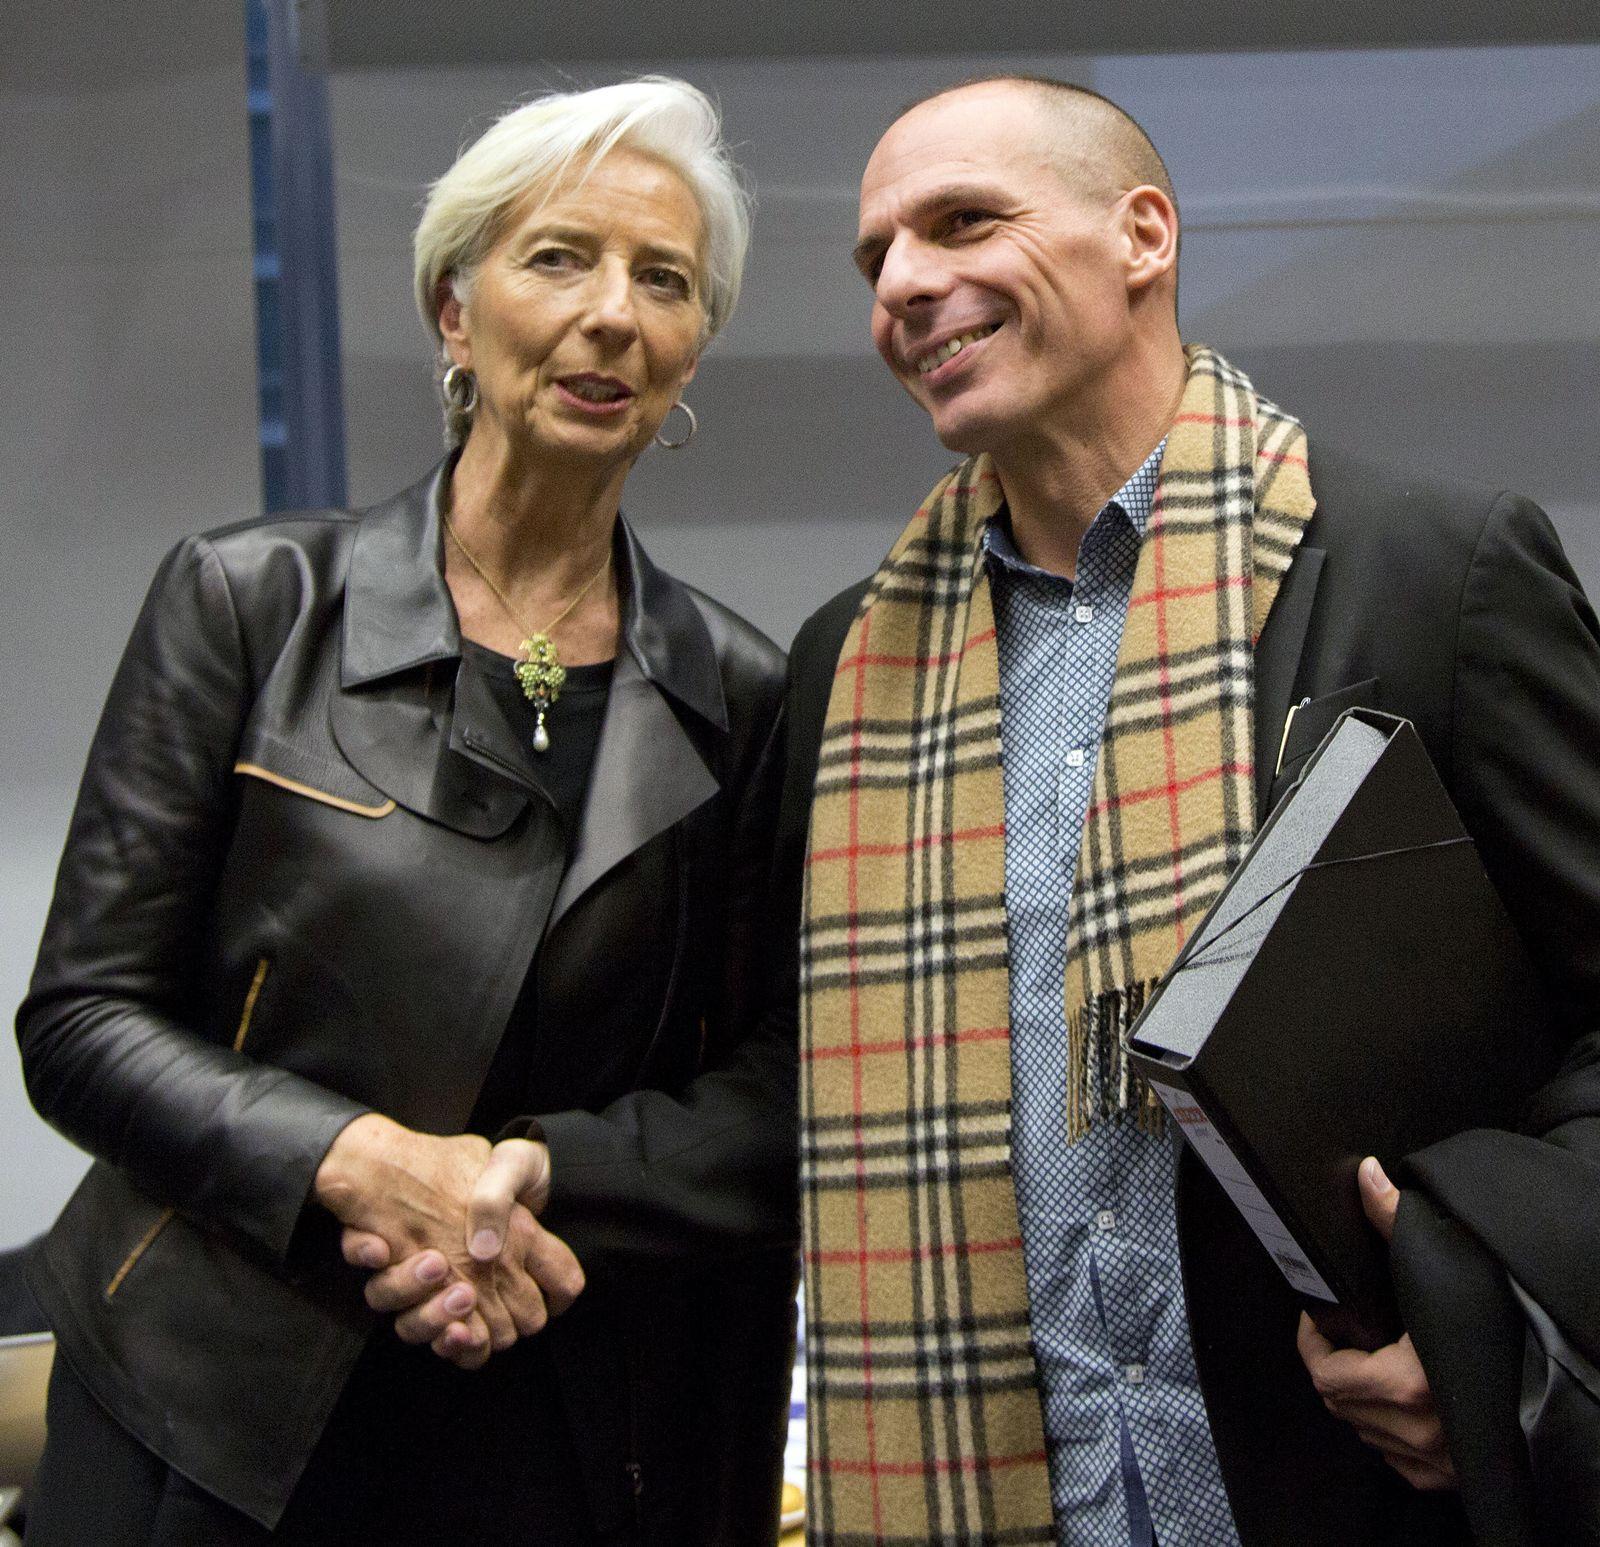 Lagarde / Varoufakis / Griechenland / Schulden / IWF